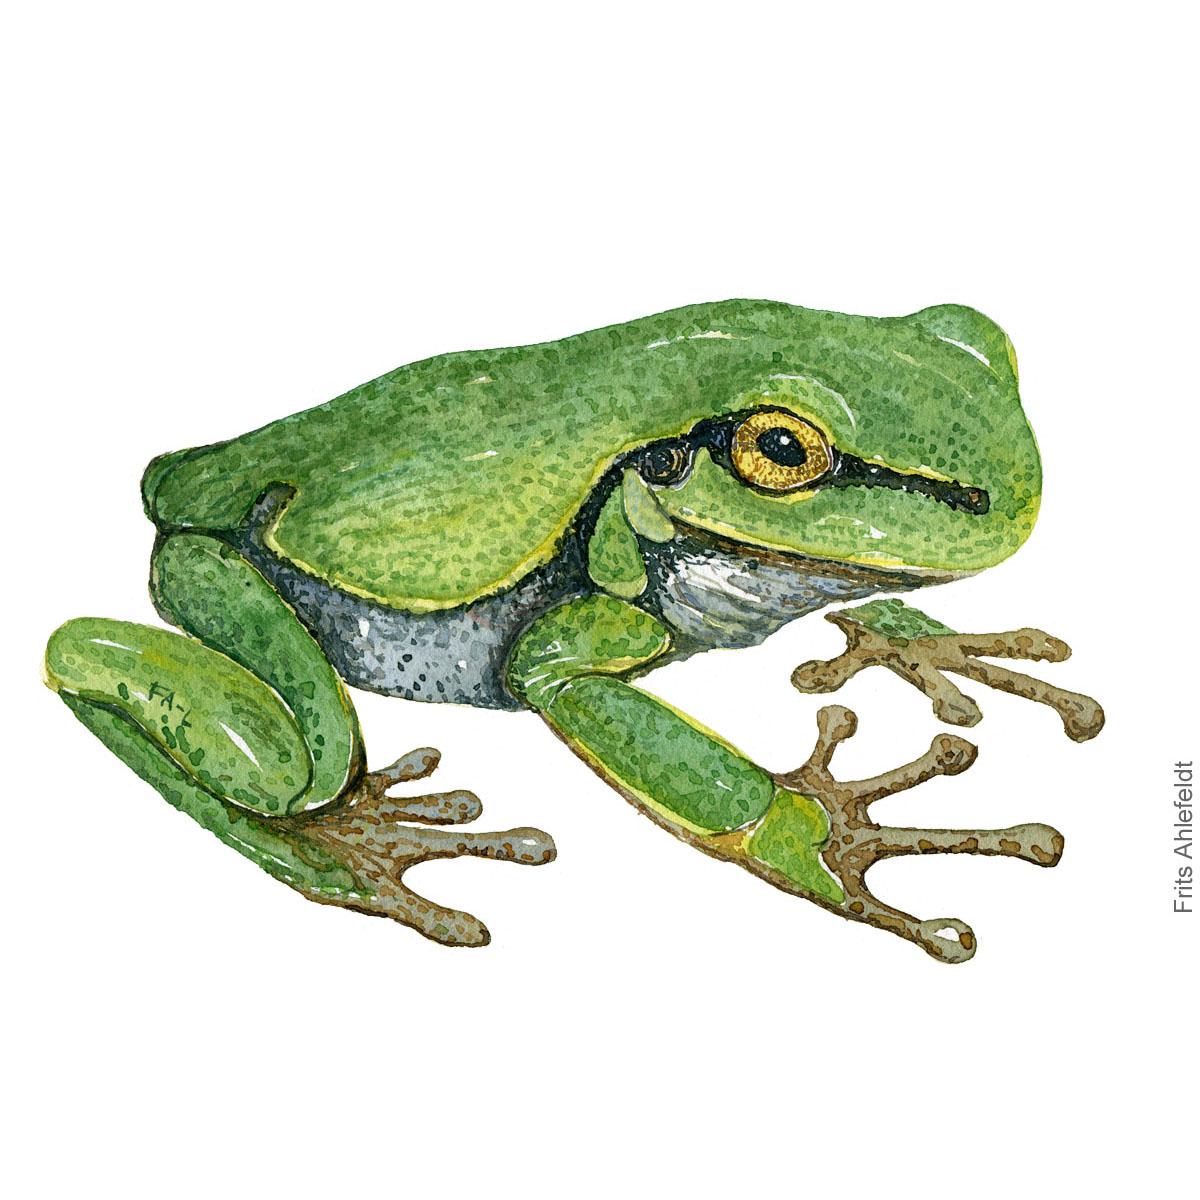 Loevfroe - Hyla aborea - European treefrog watercolor illustration by Frits Ahlefeldt. Akvarel af padde